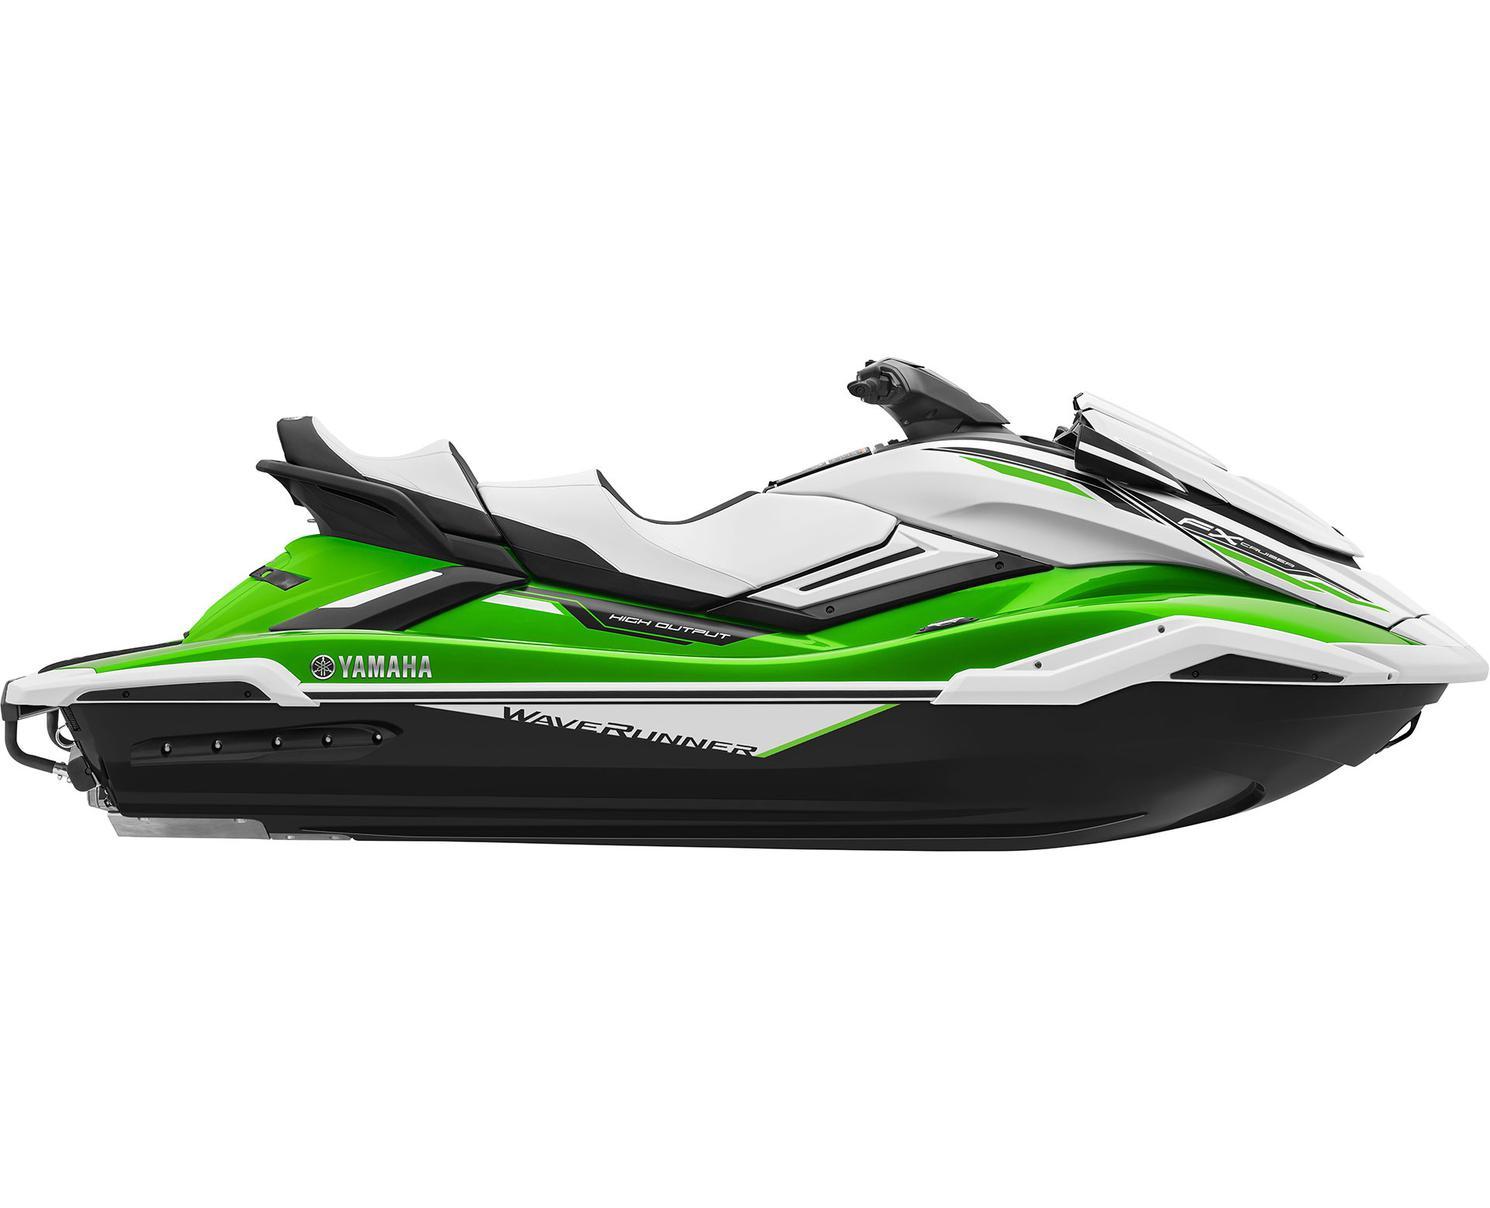 2021 Yamaha FX CRUISER HO Lime Green/White